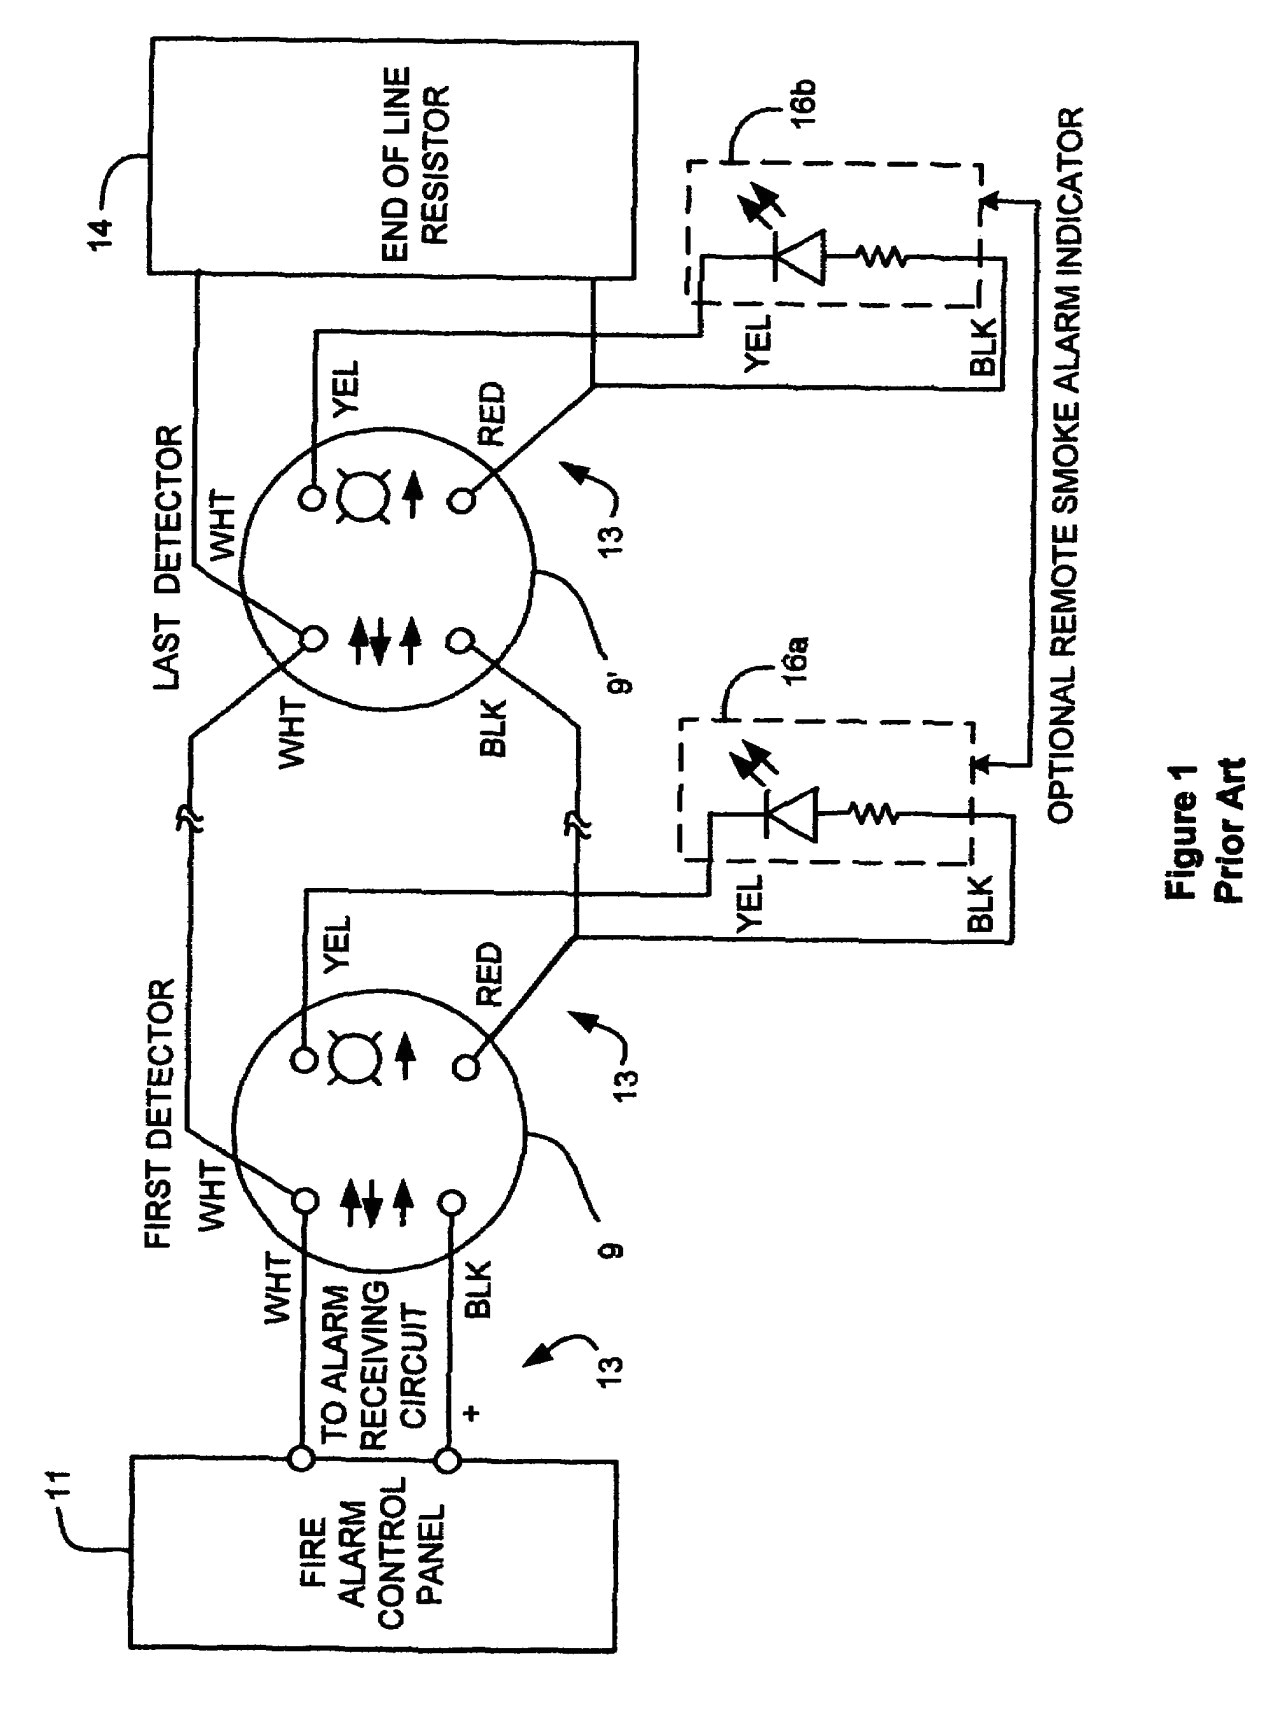 smoke detector wiring diagram beautiful smoke detector wiring diagram luxury pretty simplex smoke detector of smoke detector wiring diagram within wiring diagram for smoke detectors jpg